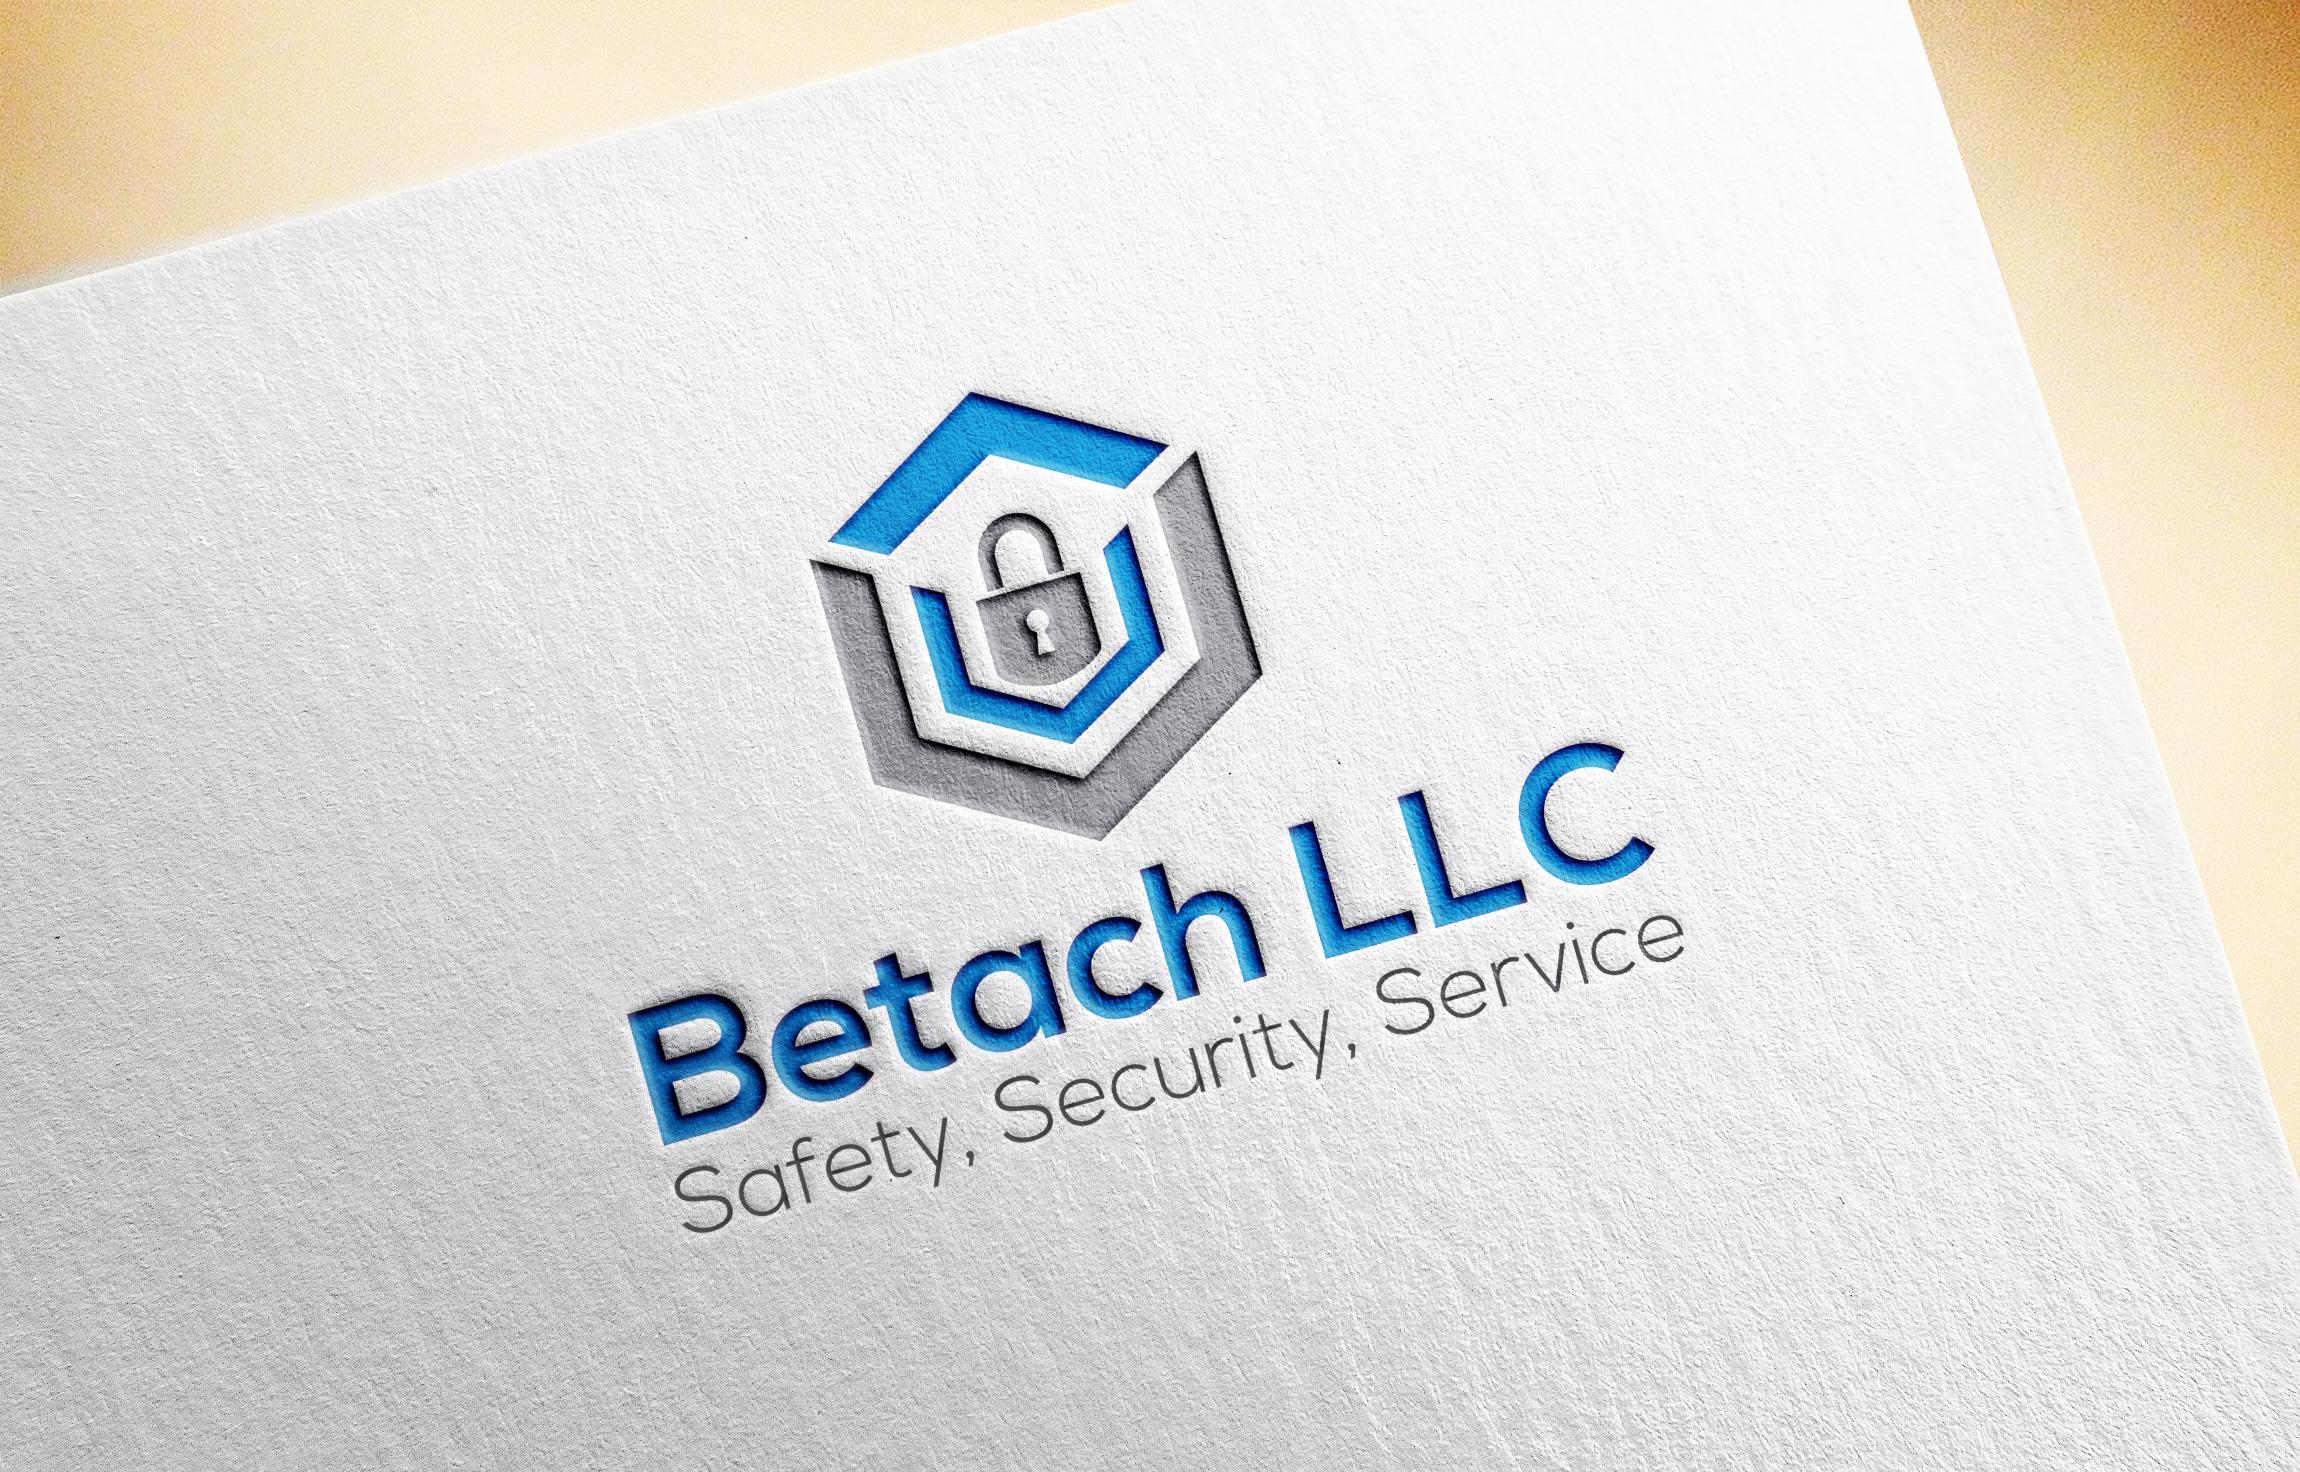 Betach LLC, Duncanville TX Locksmith